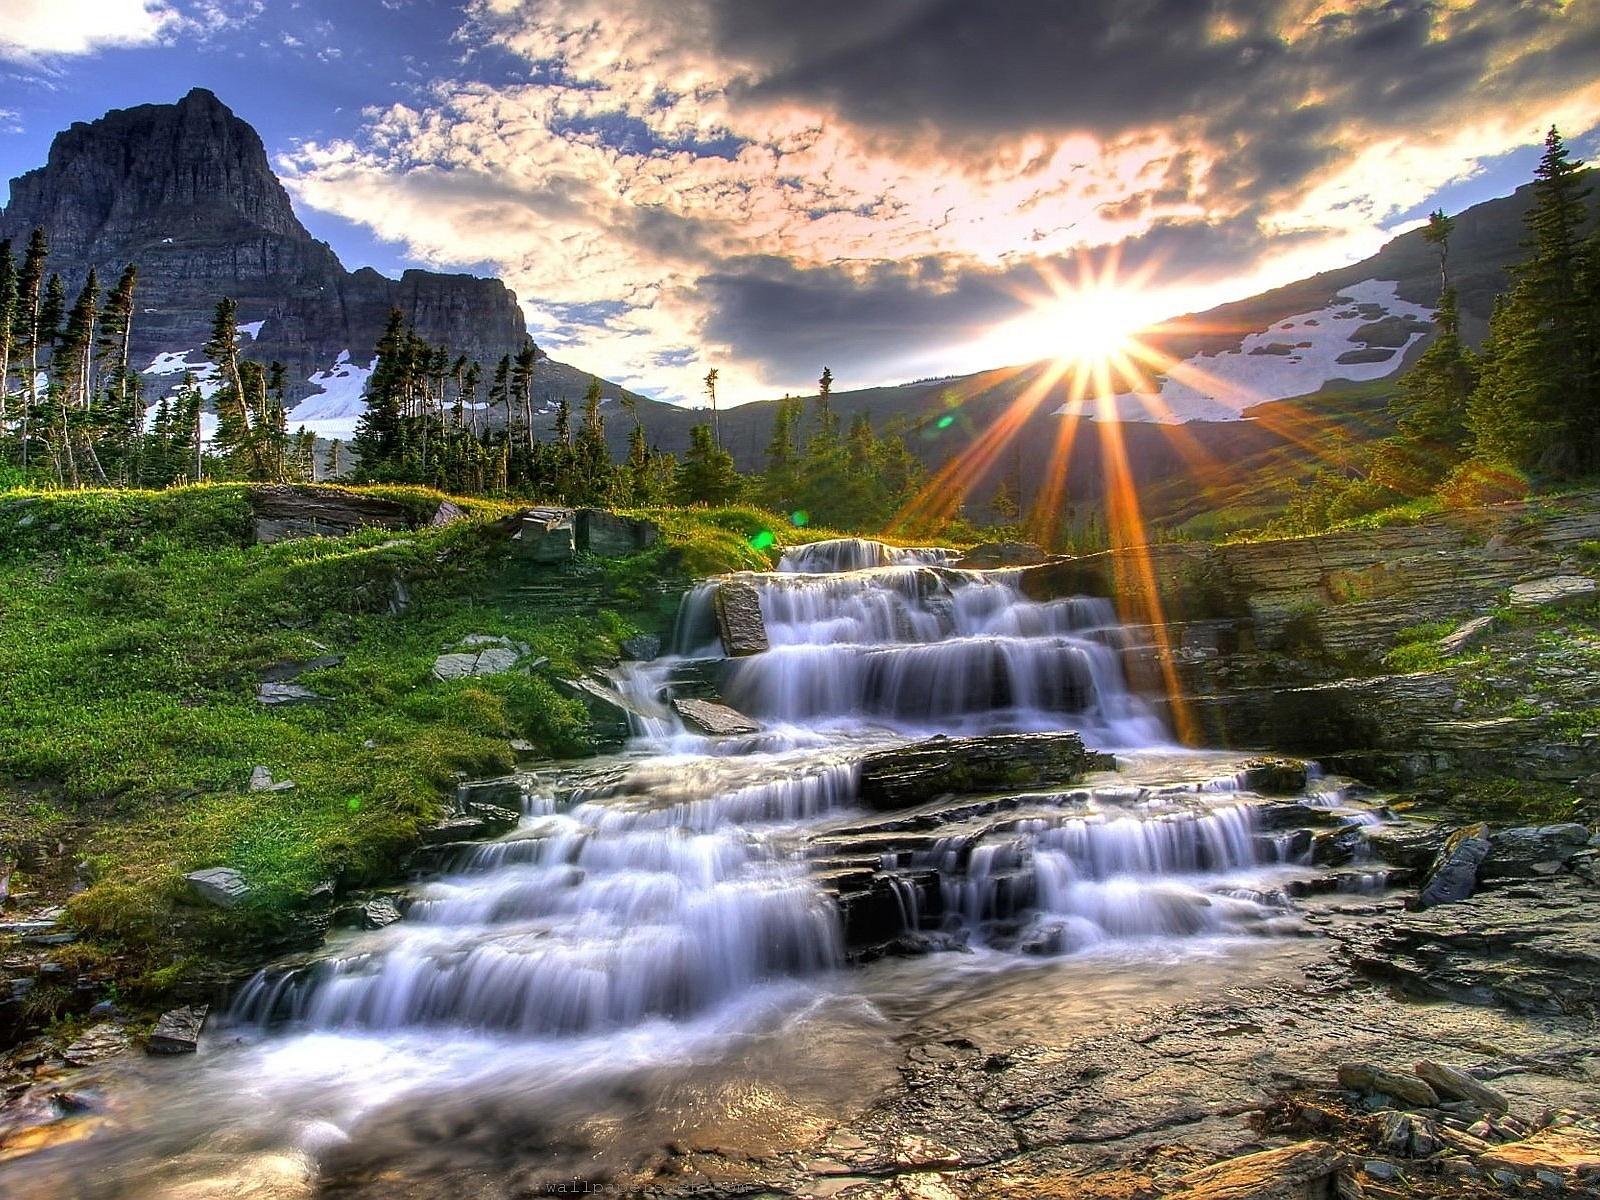 Waterfall mountain sunset 16001200 many worlds theory many worlds puzzle 4 waterfall mountain sunset 16001200 altavistaventures Images